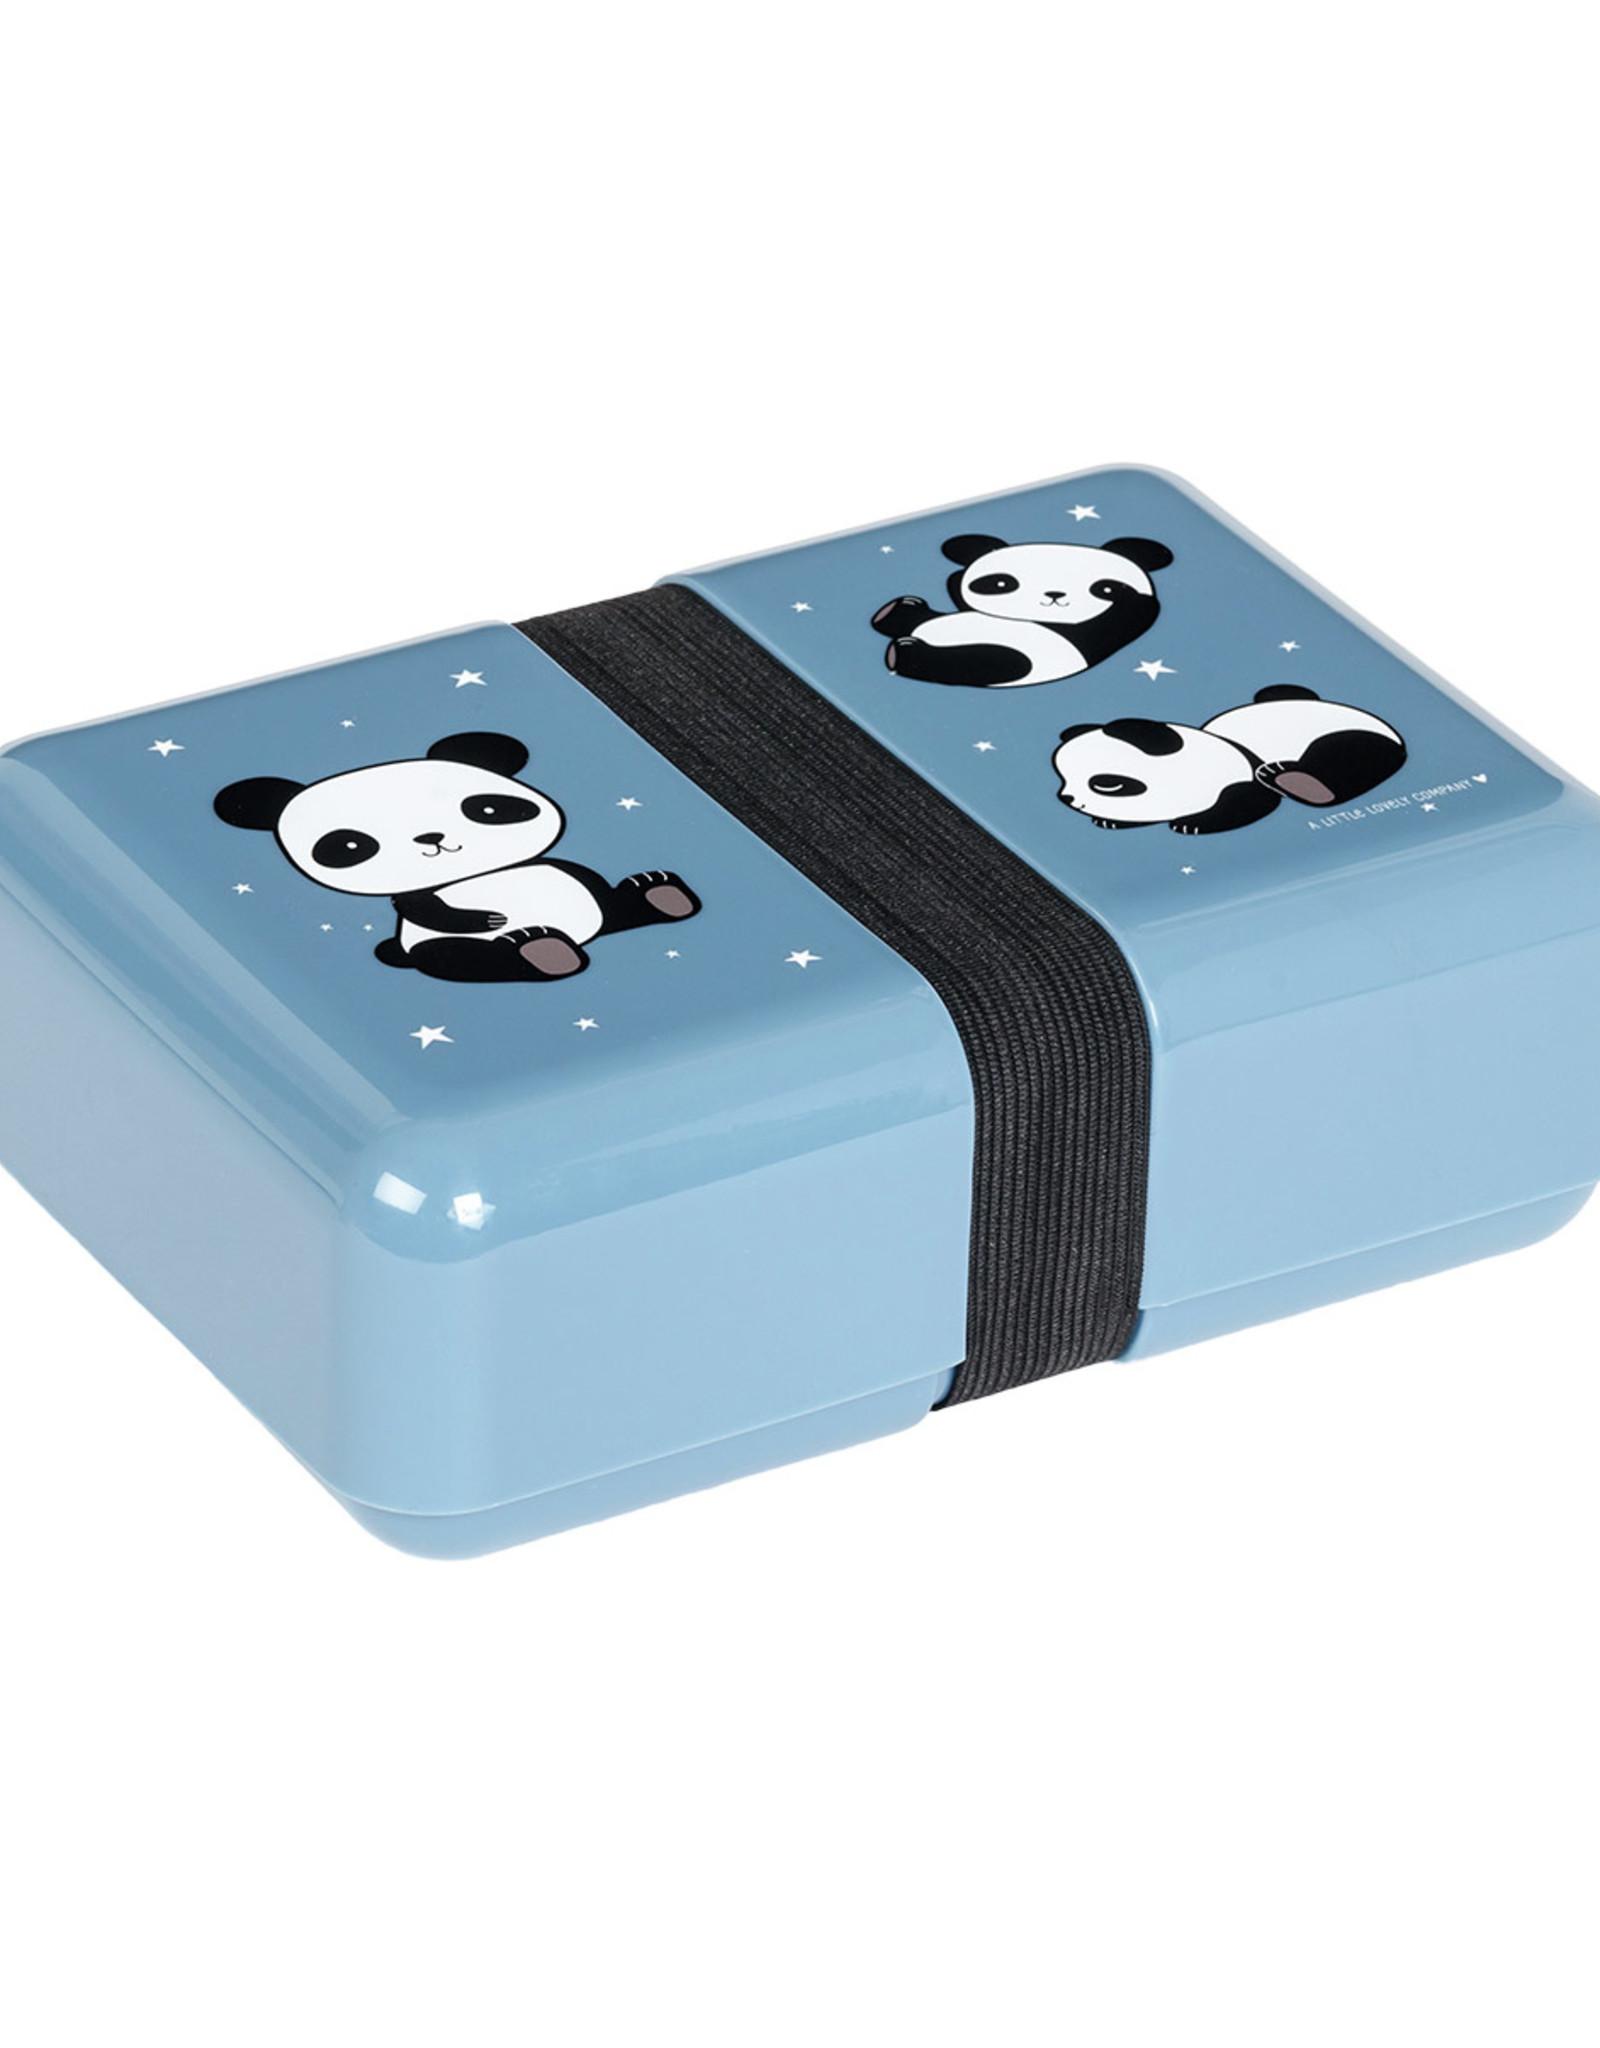 A Little Lovely Company Panda lunchbox